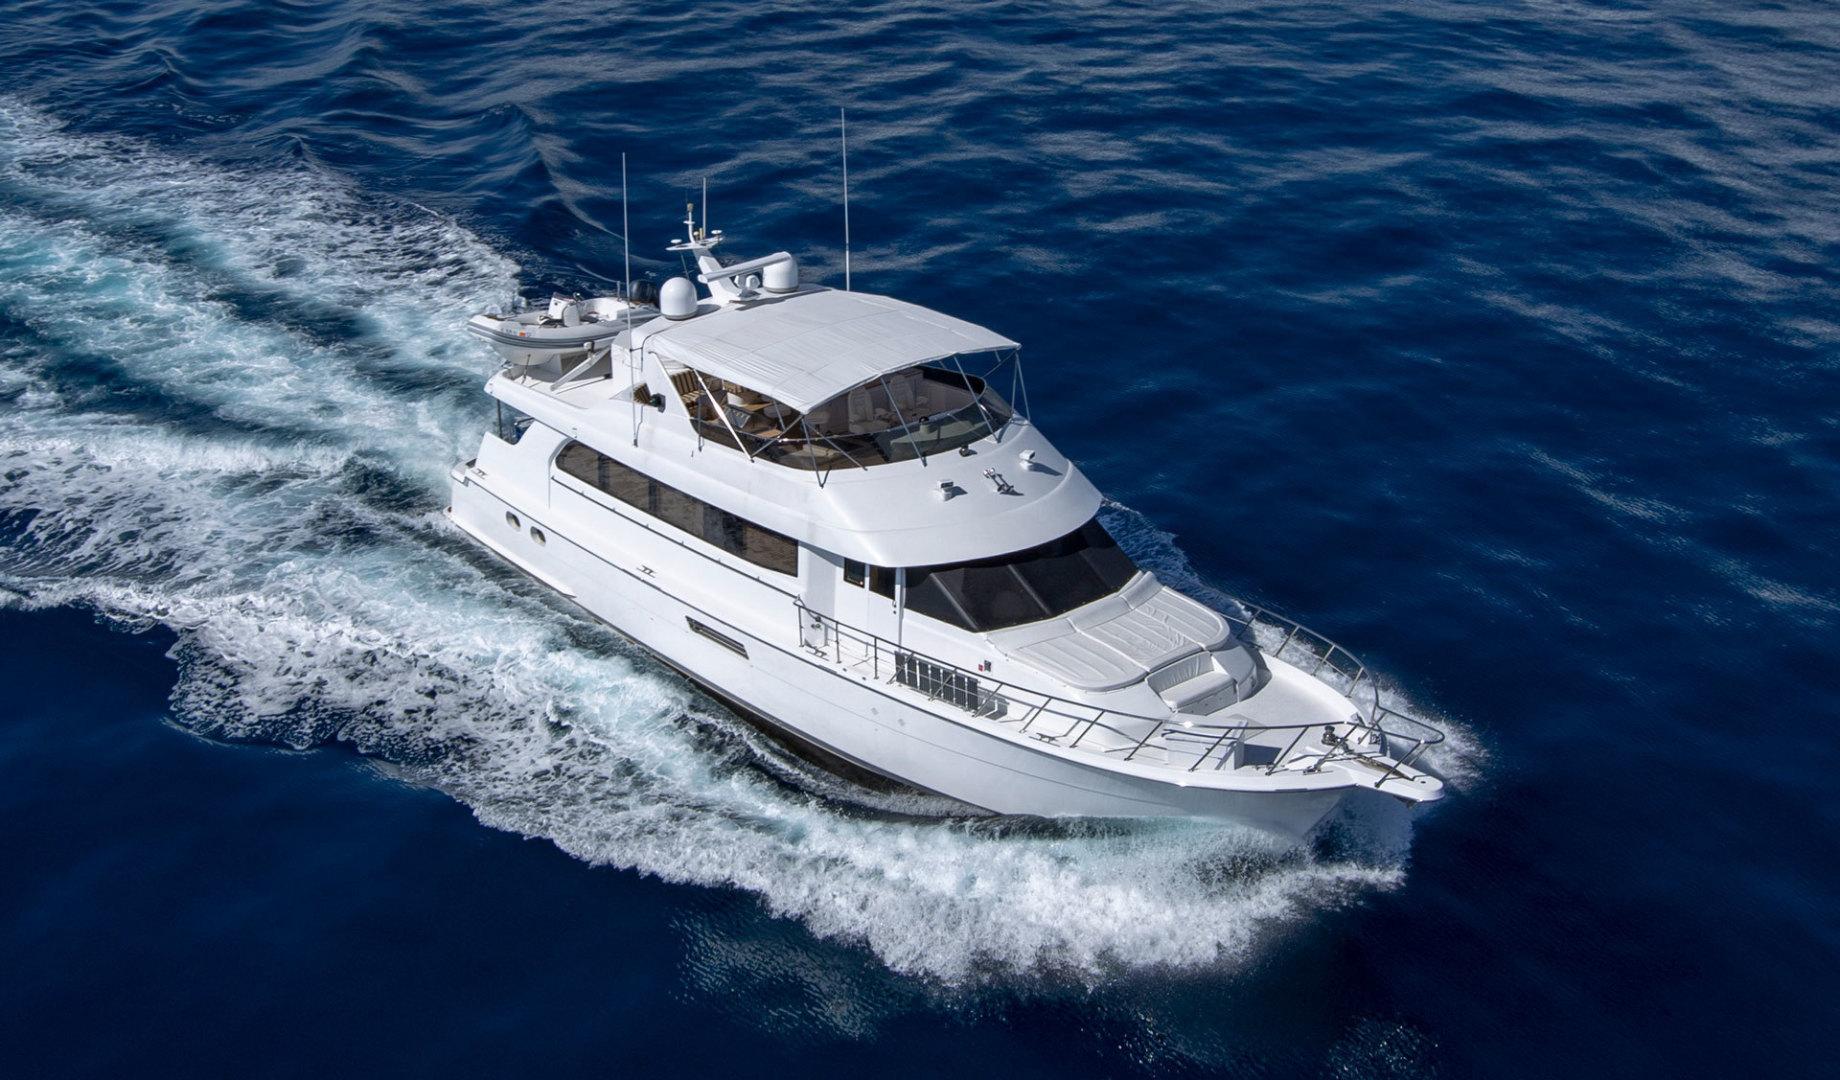 Hatteras-Cockpit Motor Yacht 2000-Getaway Ft. Lauderdale-Florida-United States-1417501 | Thumbnail